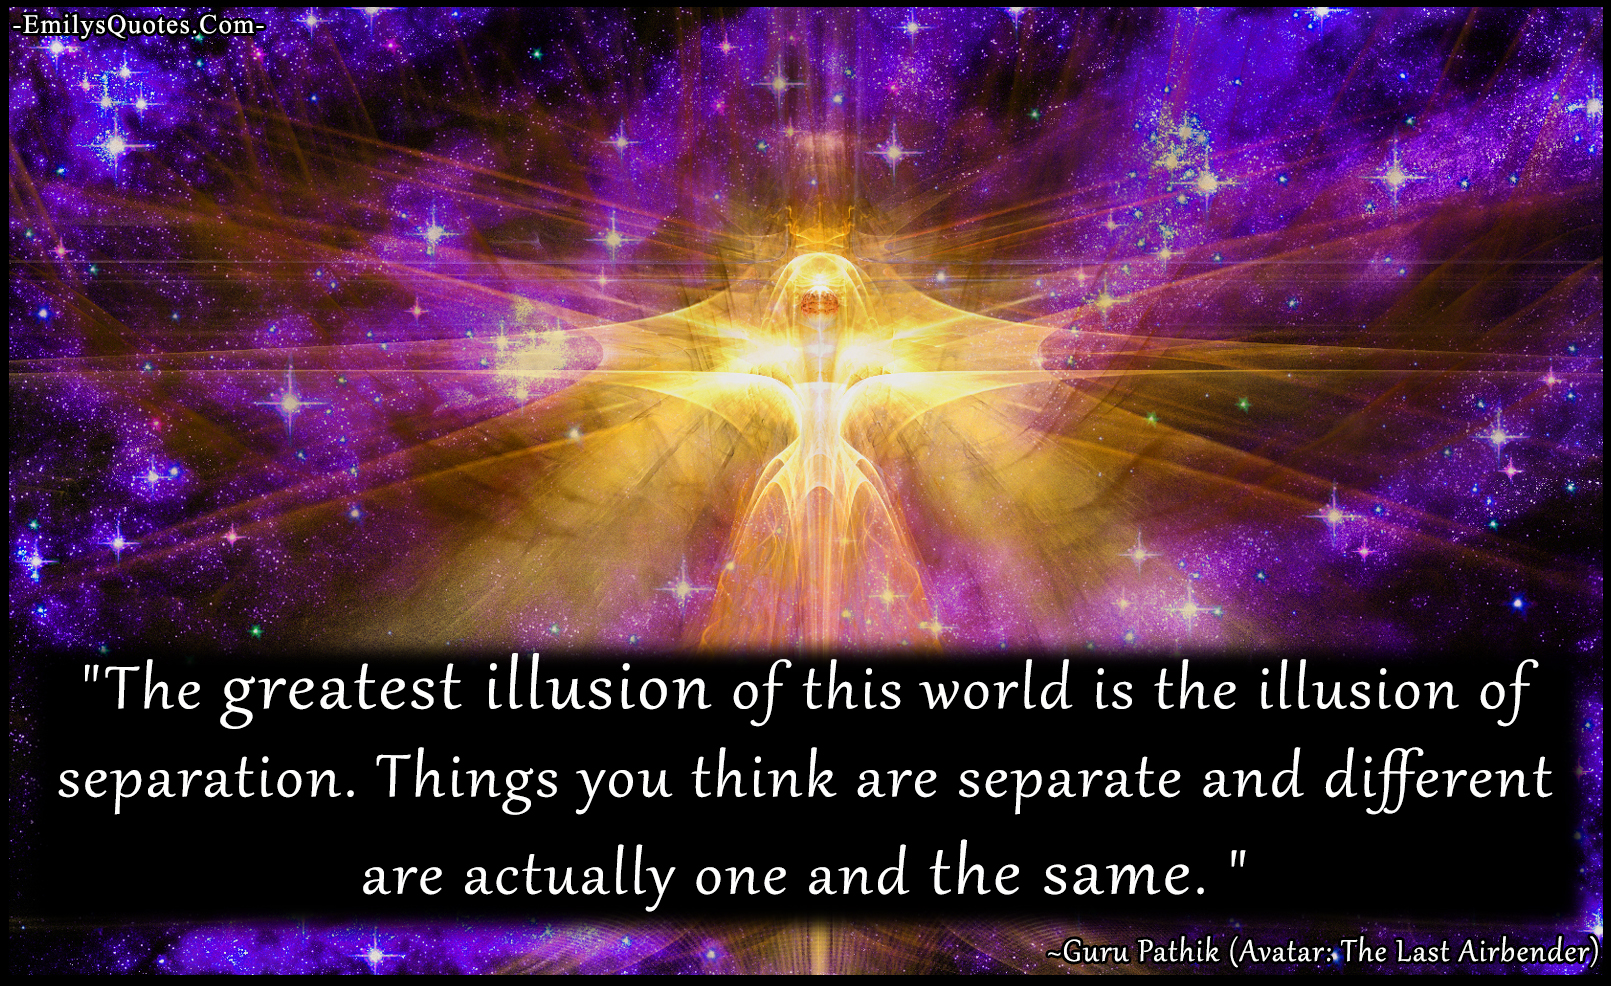 EmilysQuotes.Com - amazing, great, Guru Pathik, Avatar - The Last Airbender, wisdom, understanding, illusion, separation